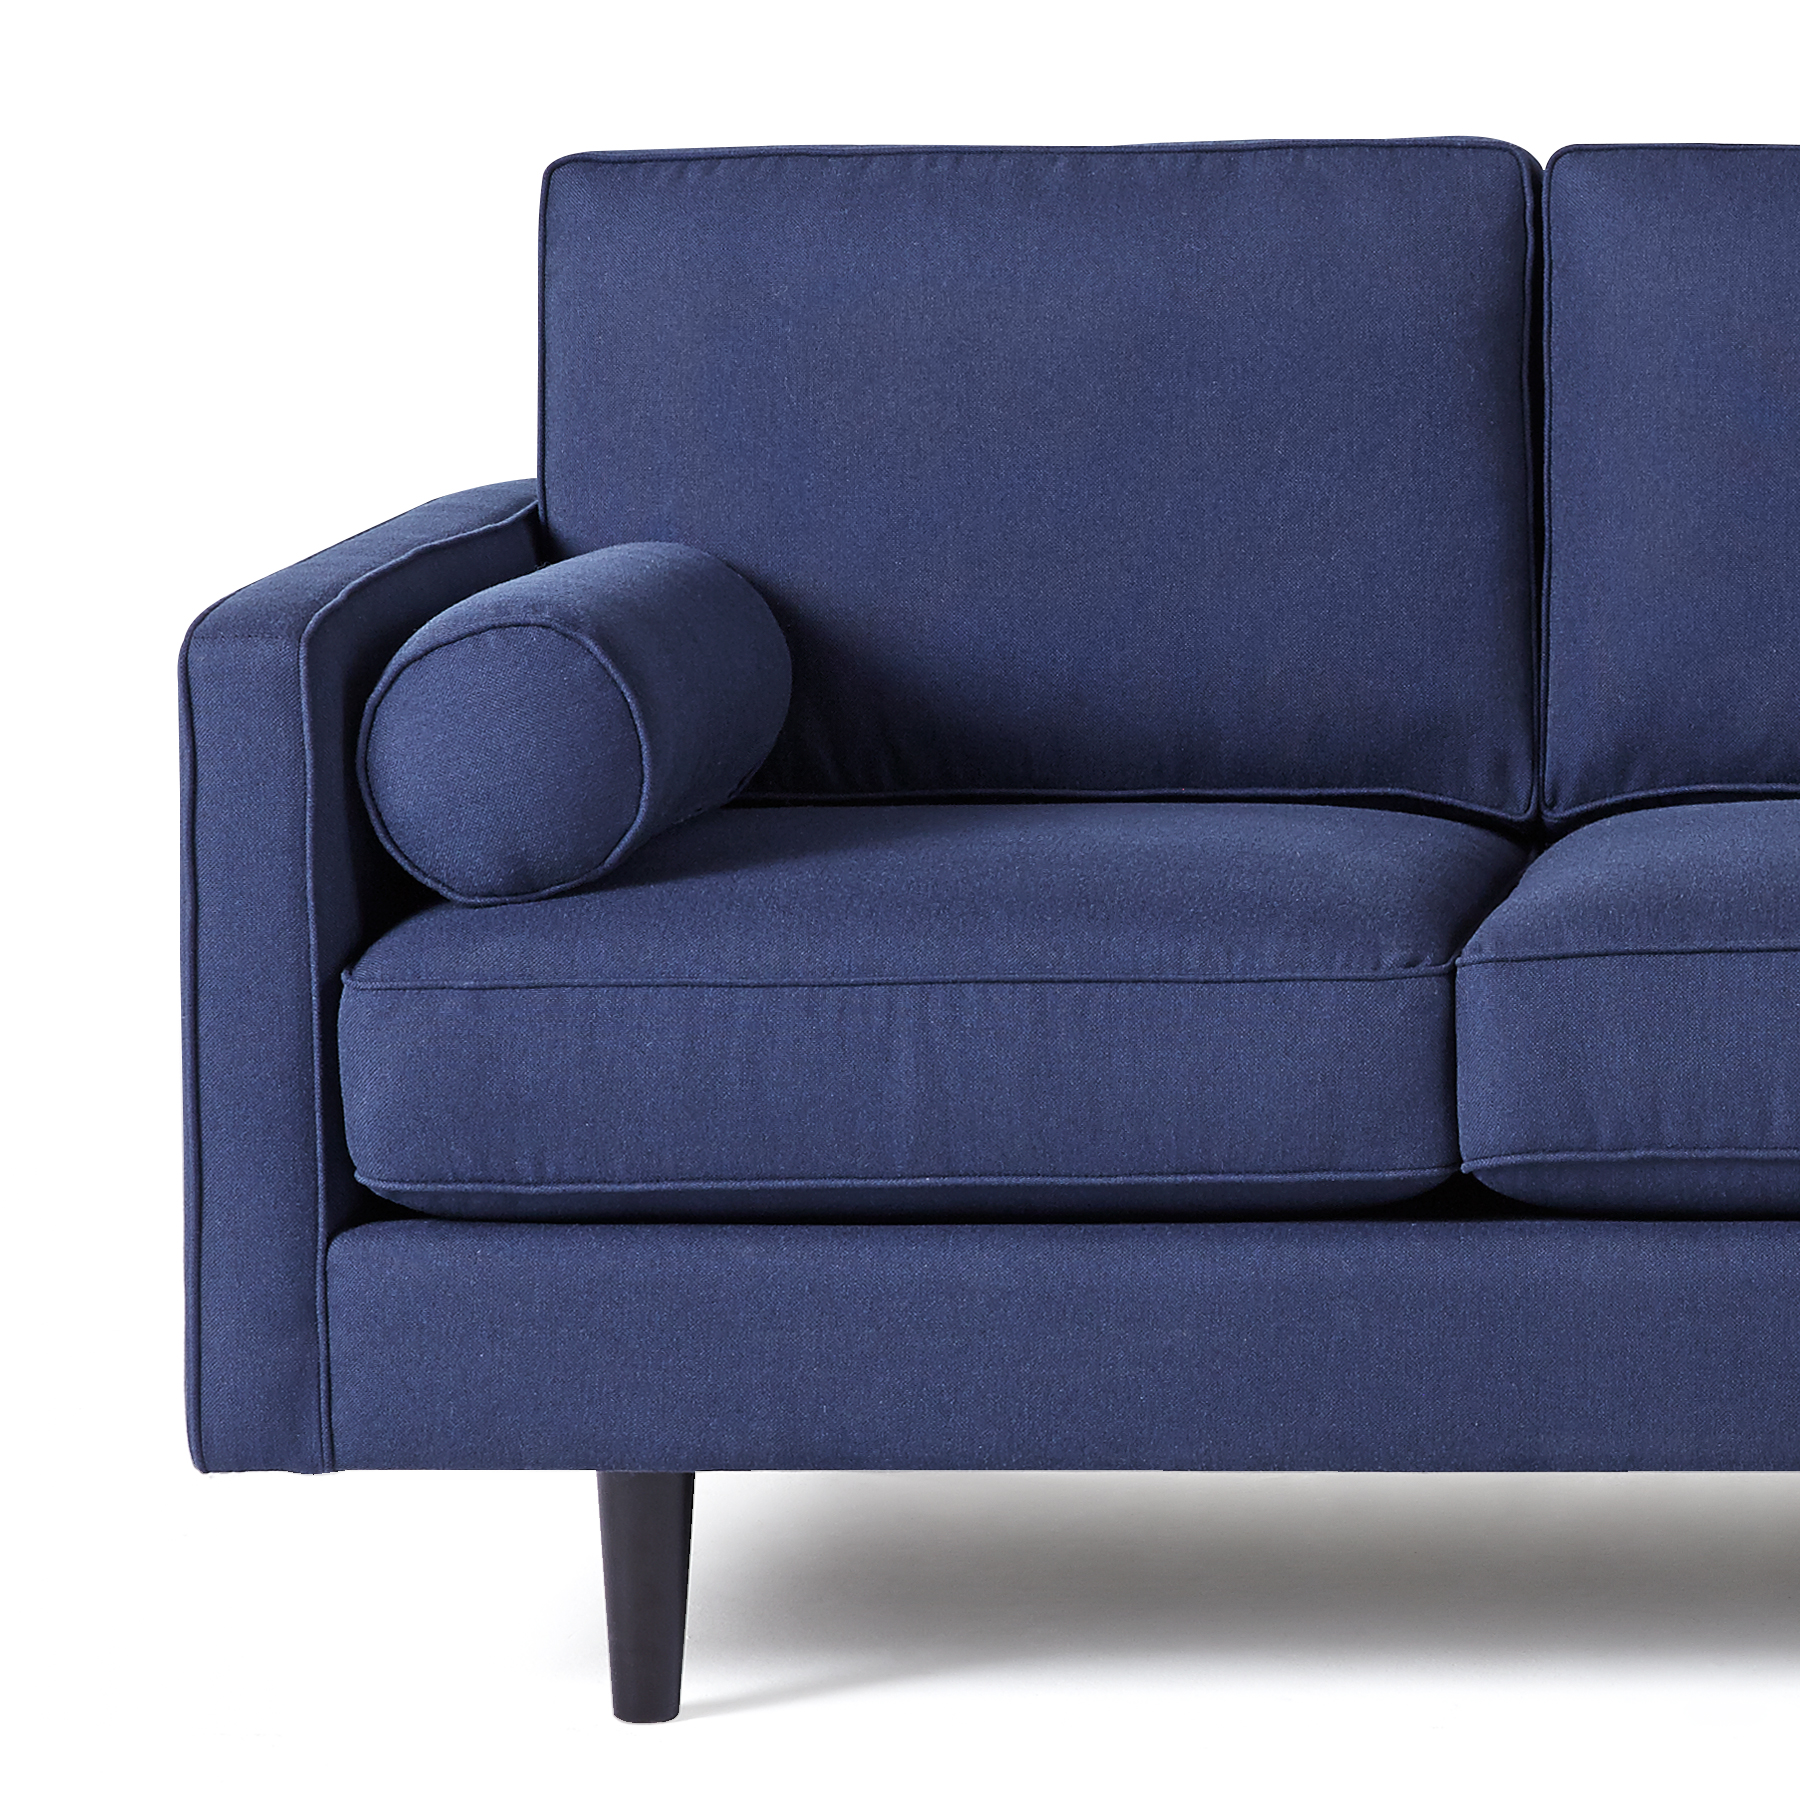 Surprising Brandon 80 Sofa 150 Fabrics Sofas And Sectionals Alphanode Cool Chair Designs And Ideas Alphanodeonline